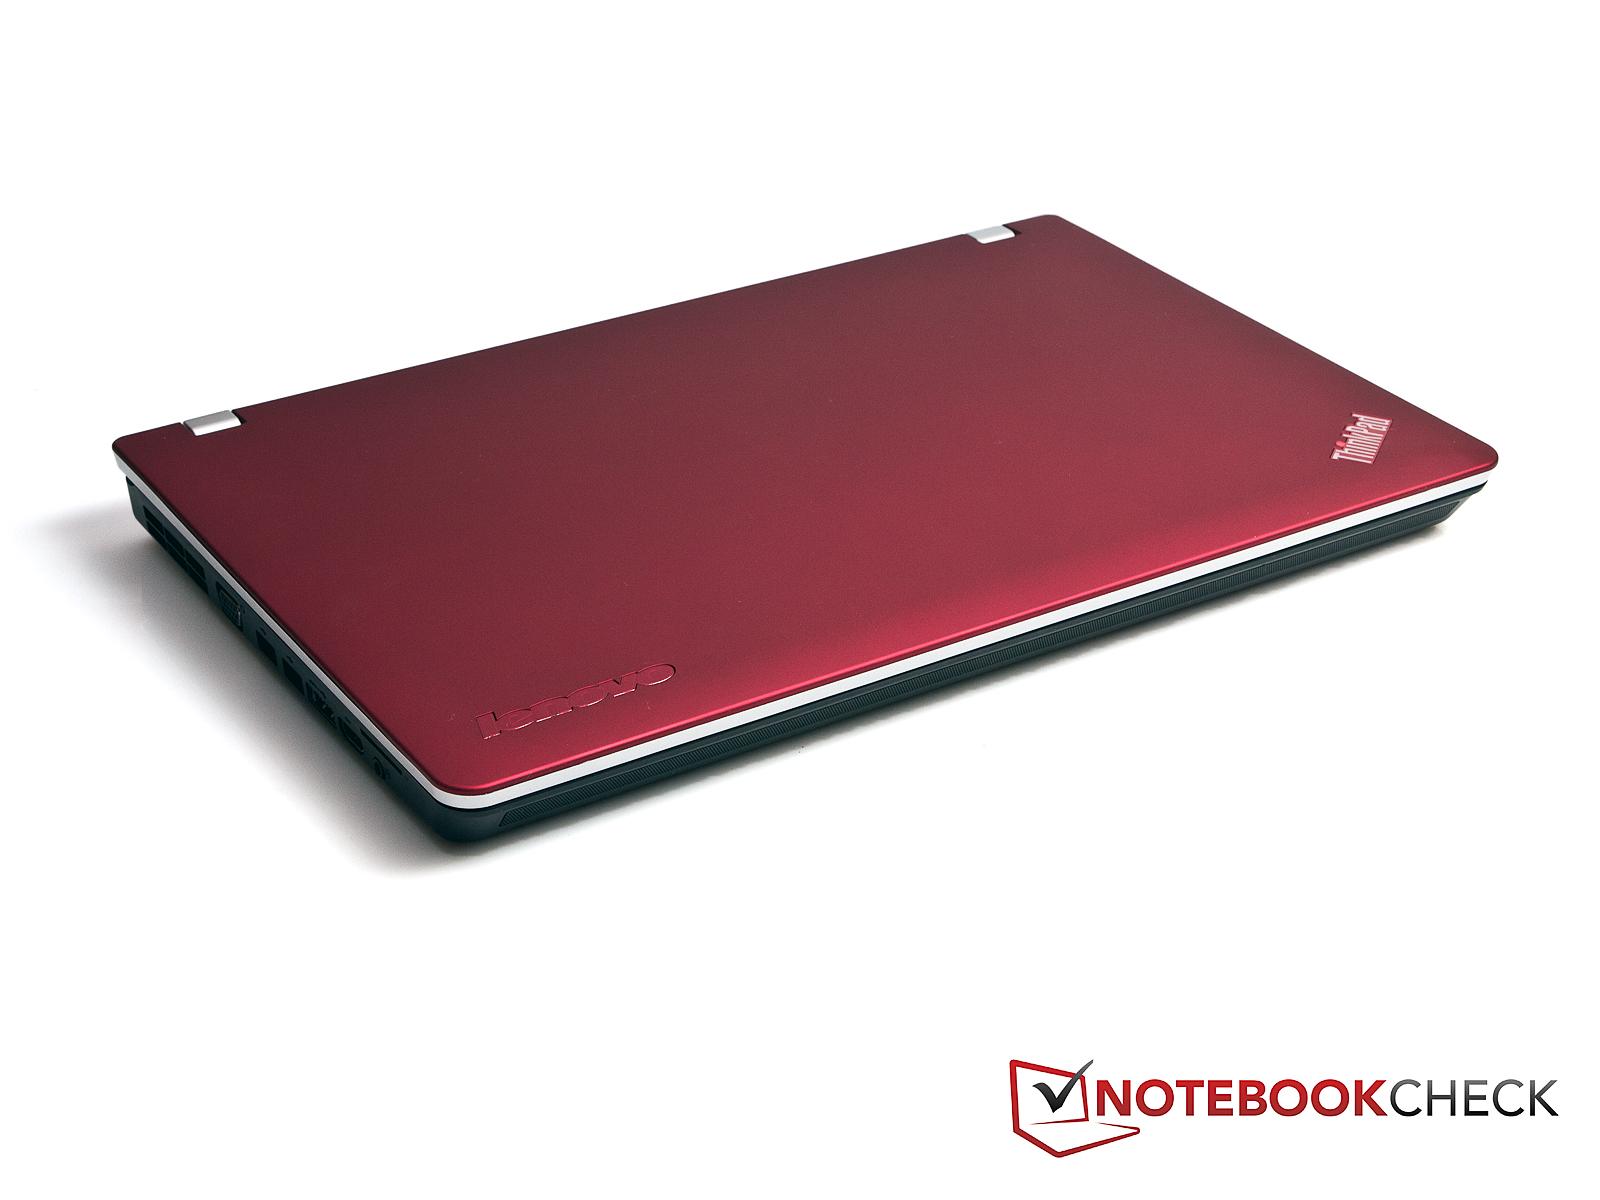 Lenovo ThinkPad Edge E525 Windows 7 64-BIT